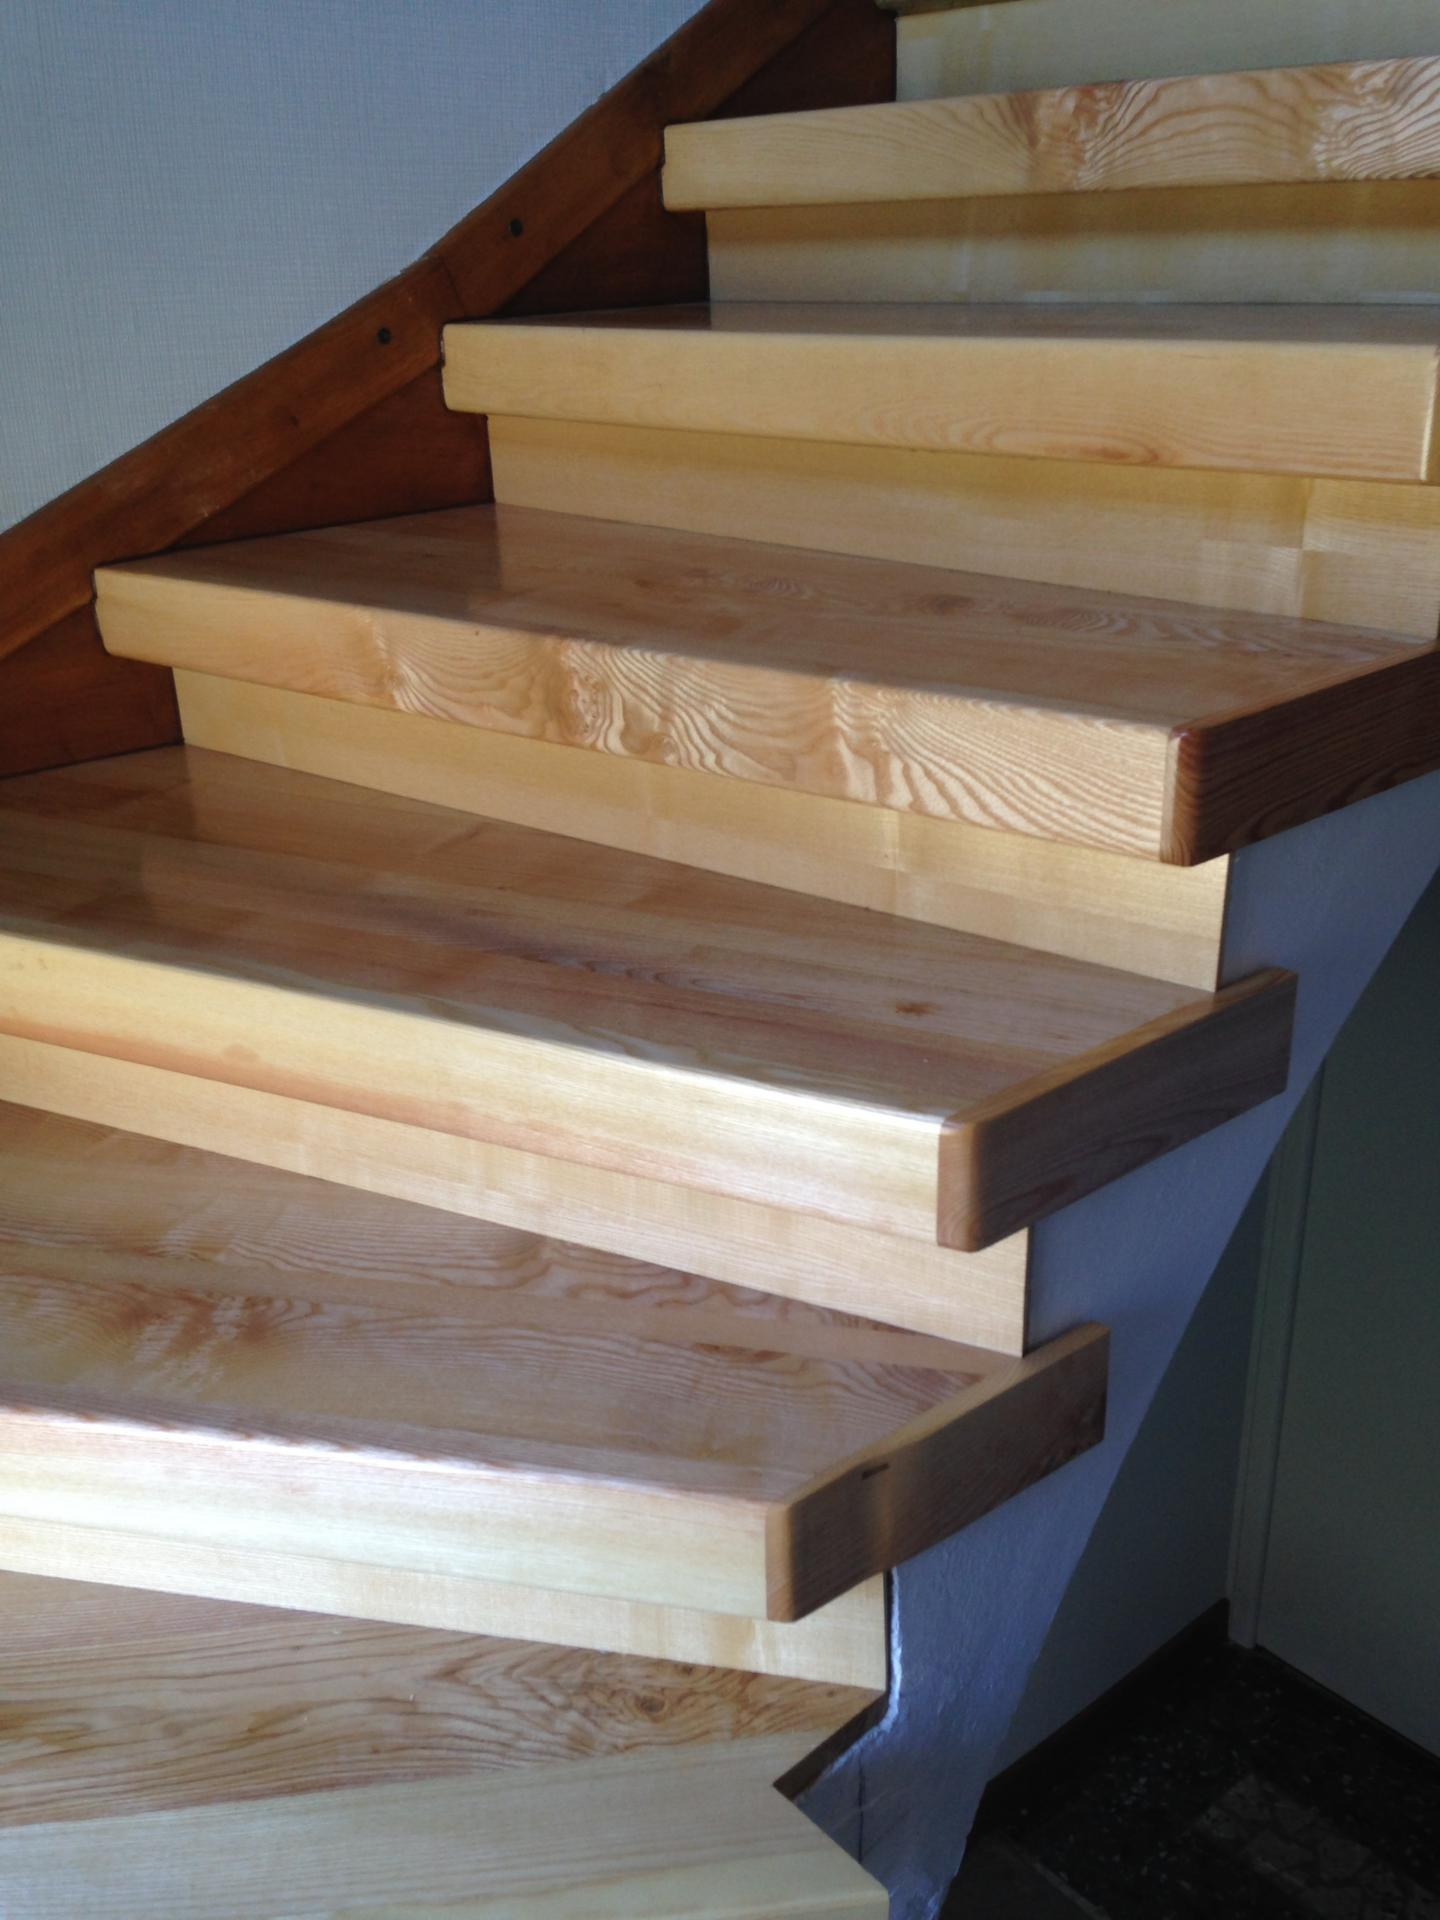 habillage fr ne sur escalier b ton. Black Bedroom Furniture Sets. Home Design Ideas